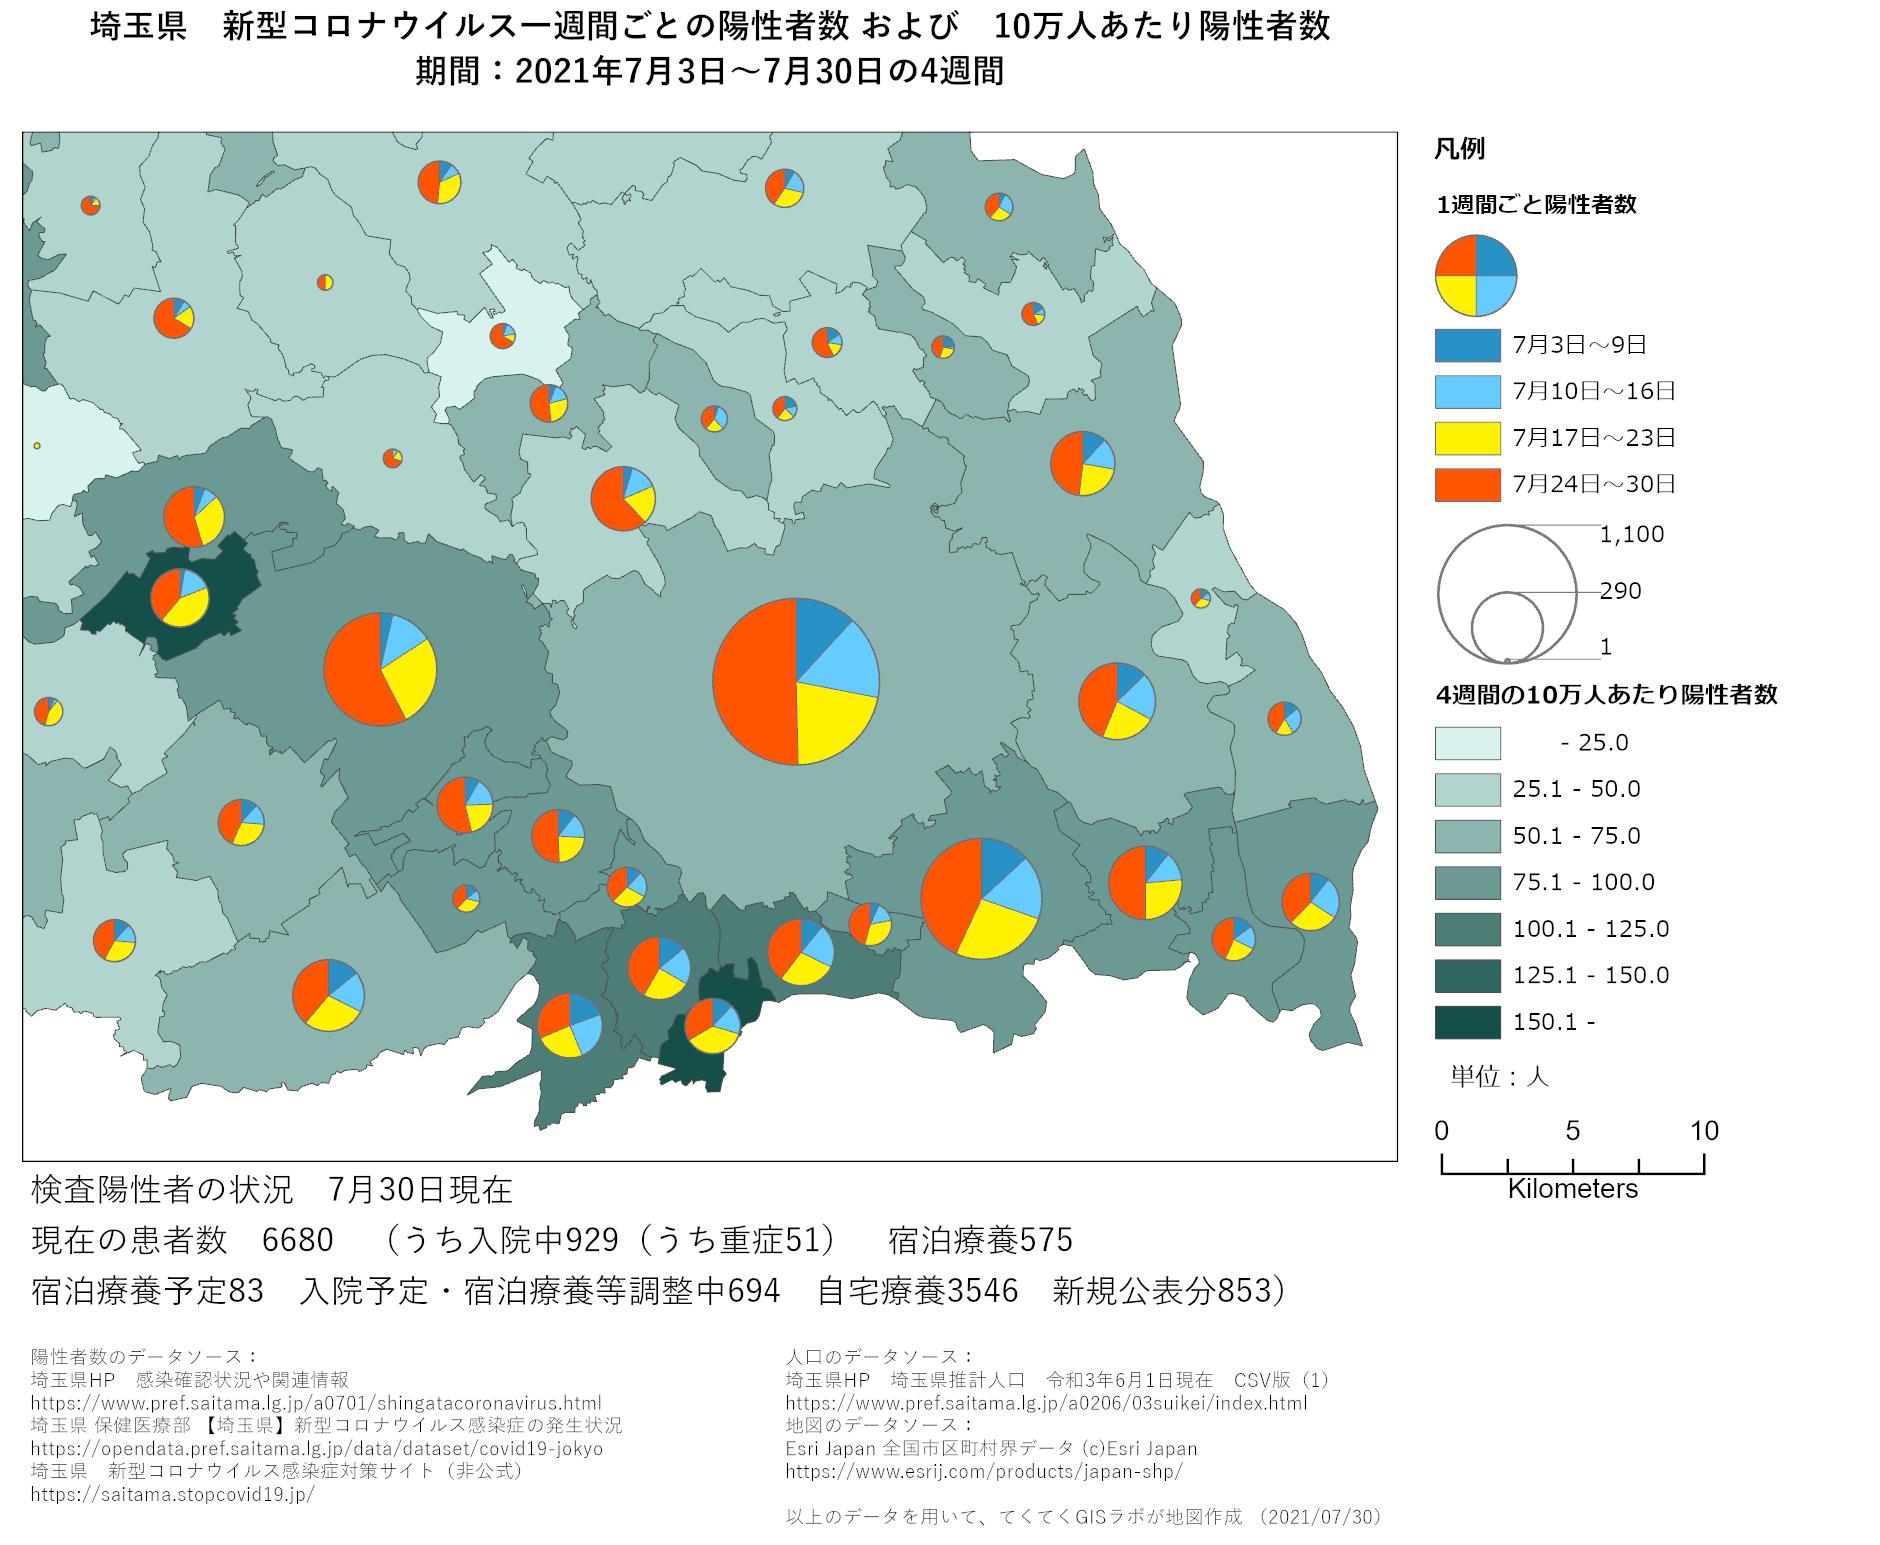 1週間ごと感染者数、埼玉県、7月3日〜7月30日